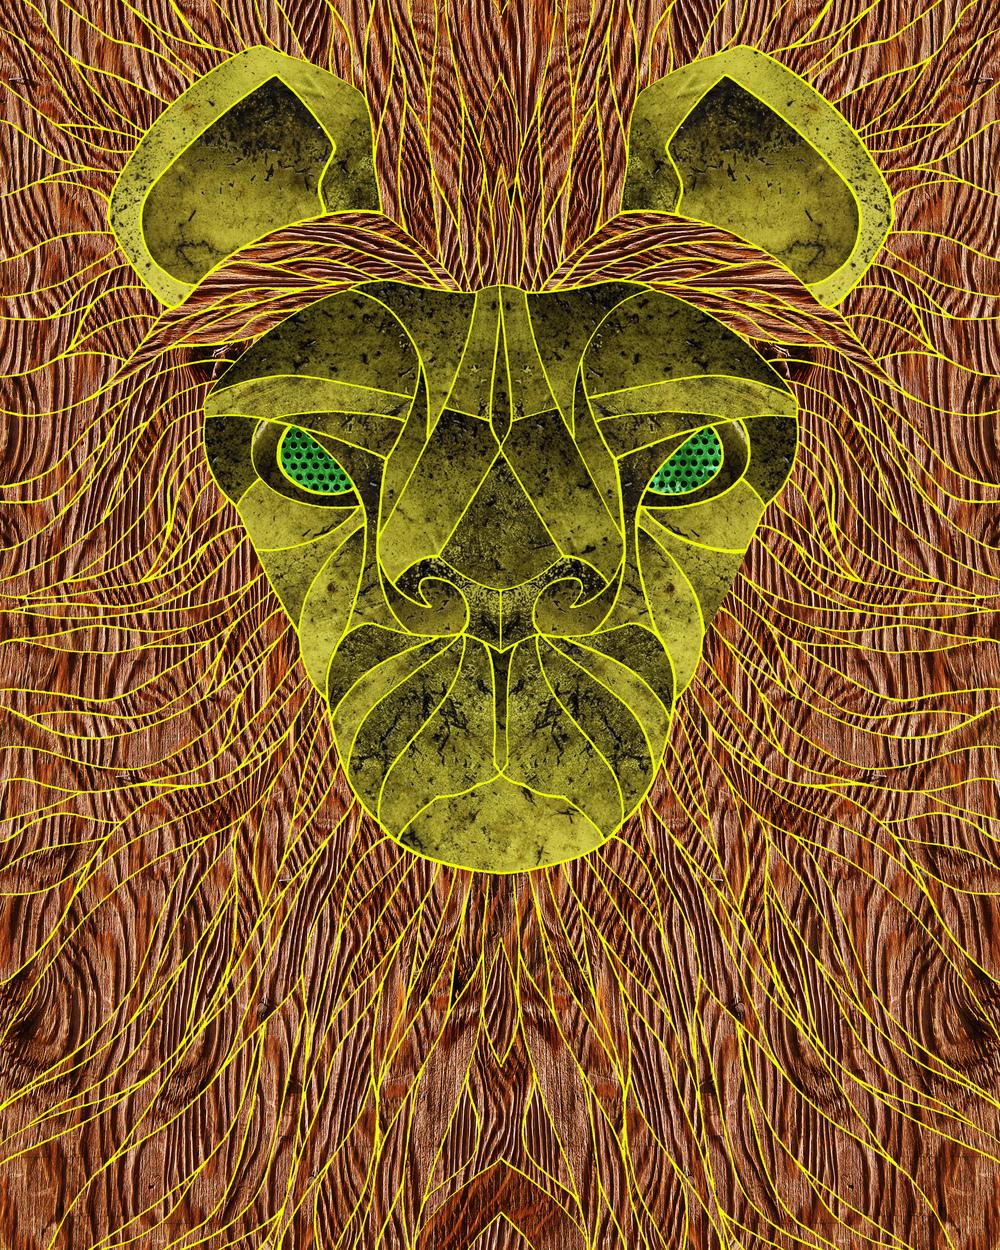 Lion 8x10.jpg